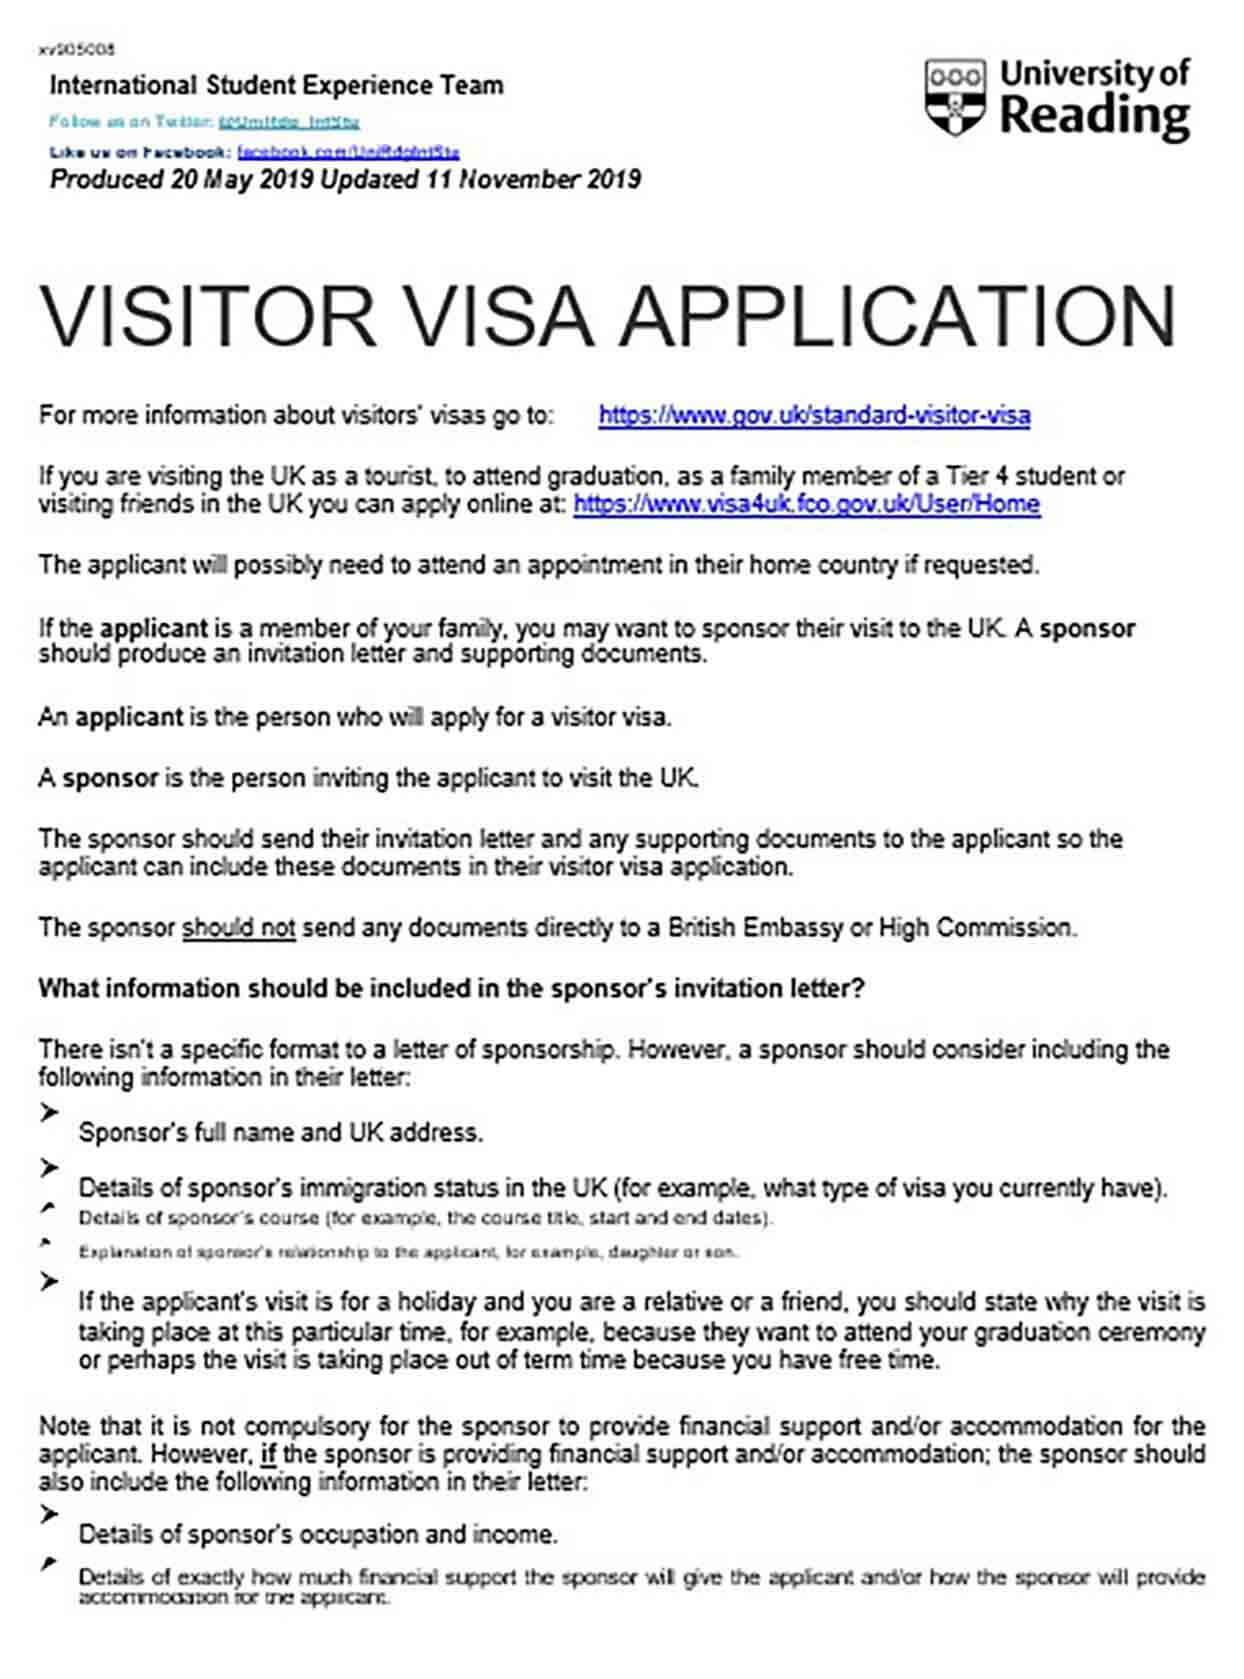 Visa Sponsorship Letter And Tips To Make The Reader